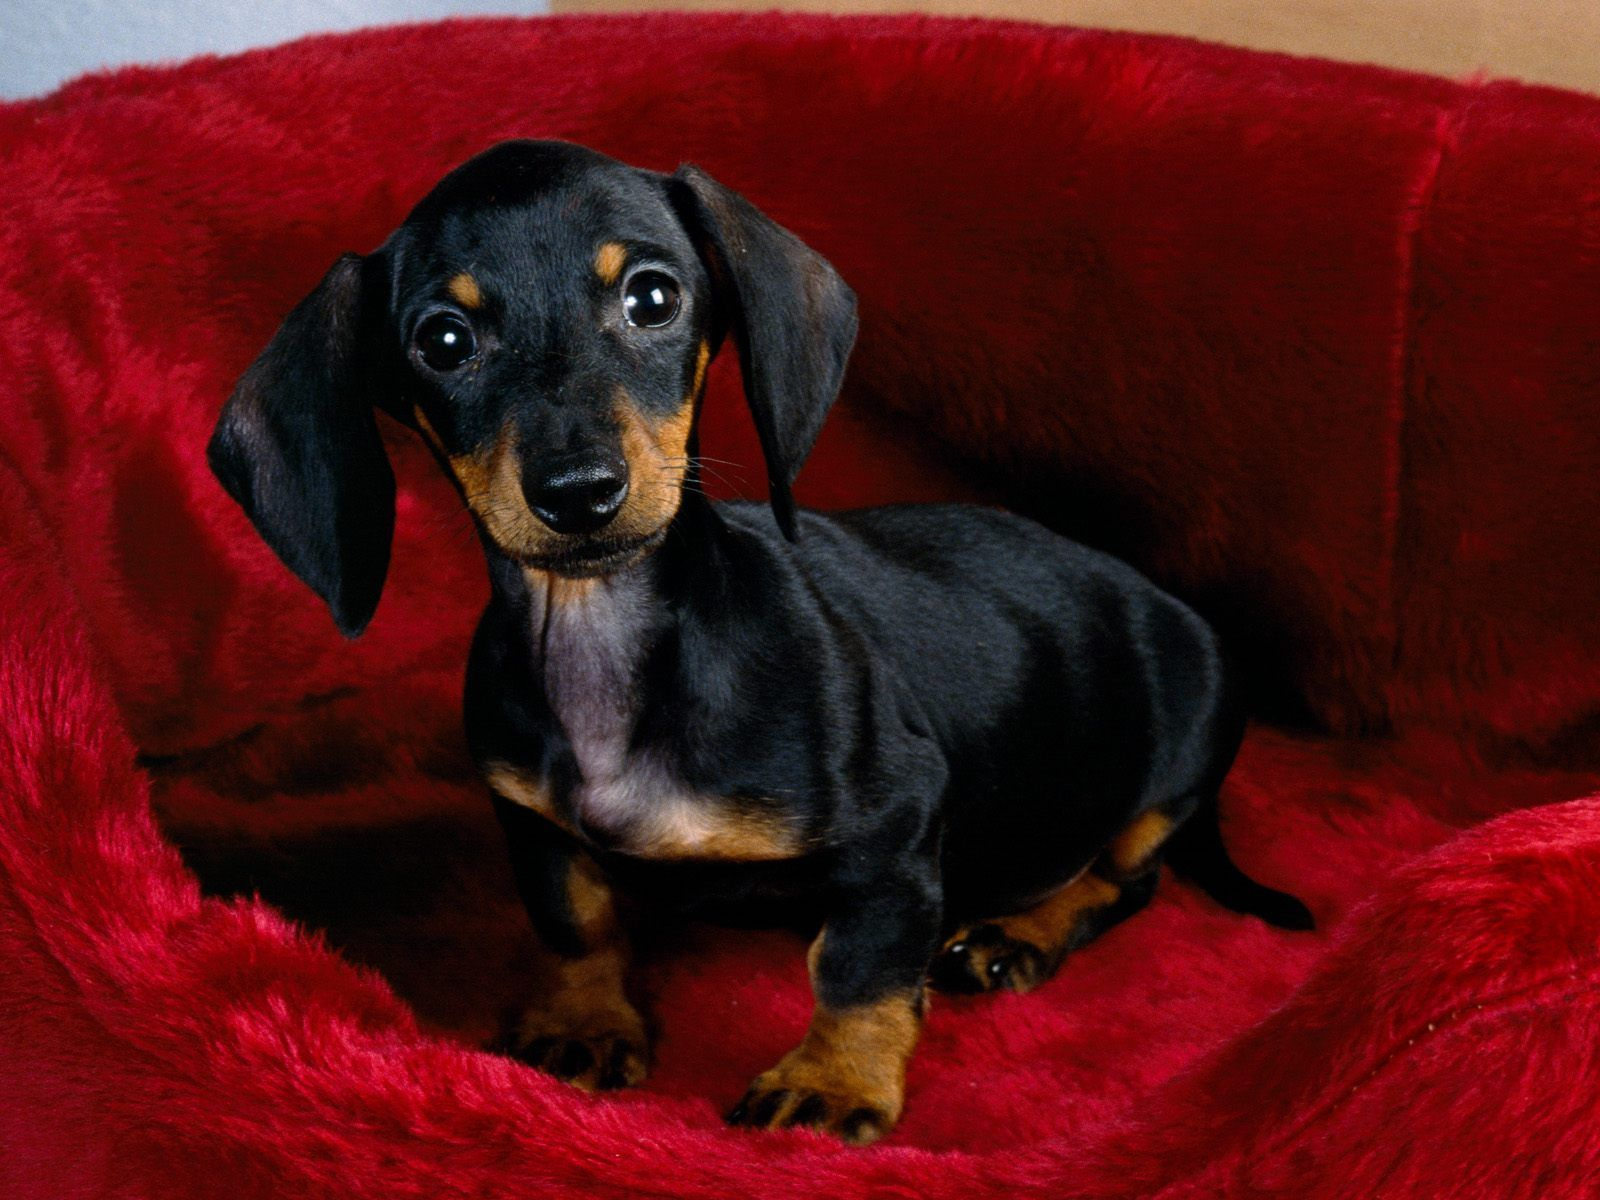 Black And Tan Dachshund Wallpaper Dachshund Dog Dachshund Puppy